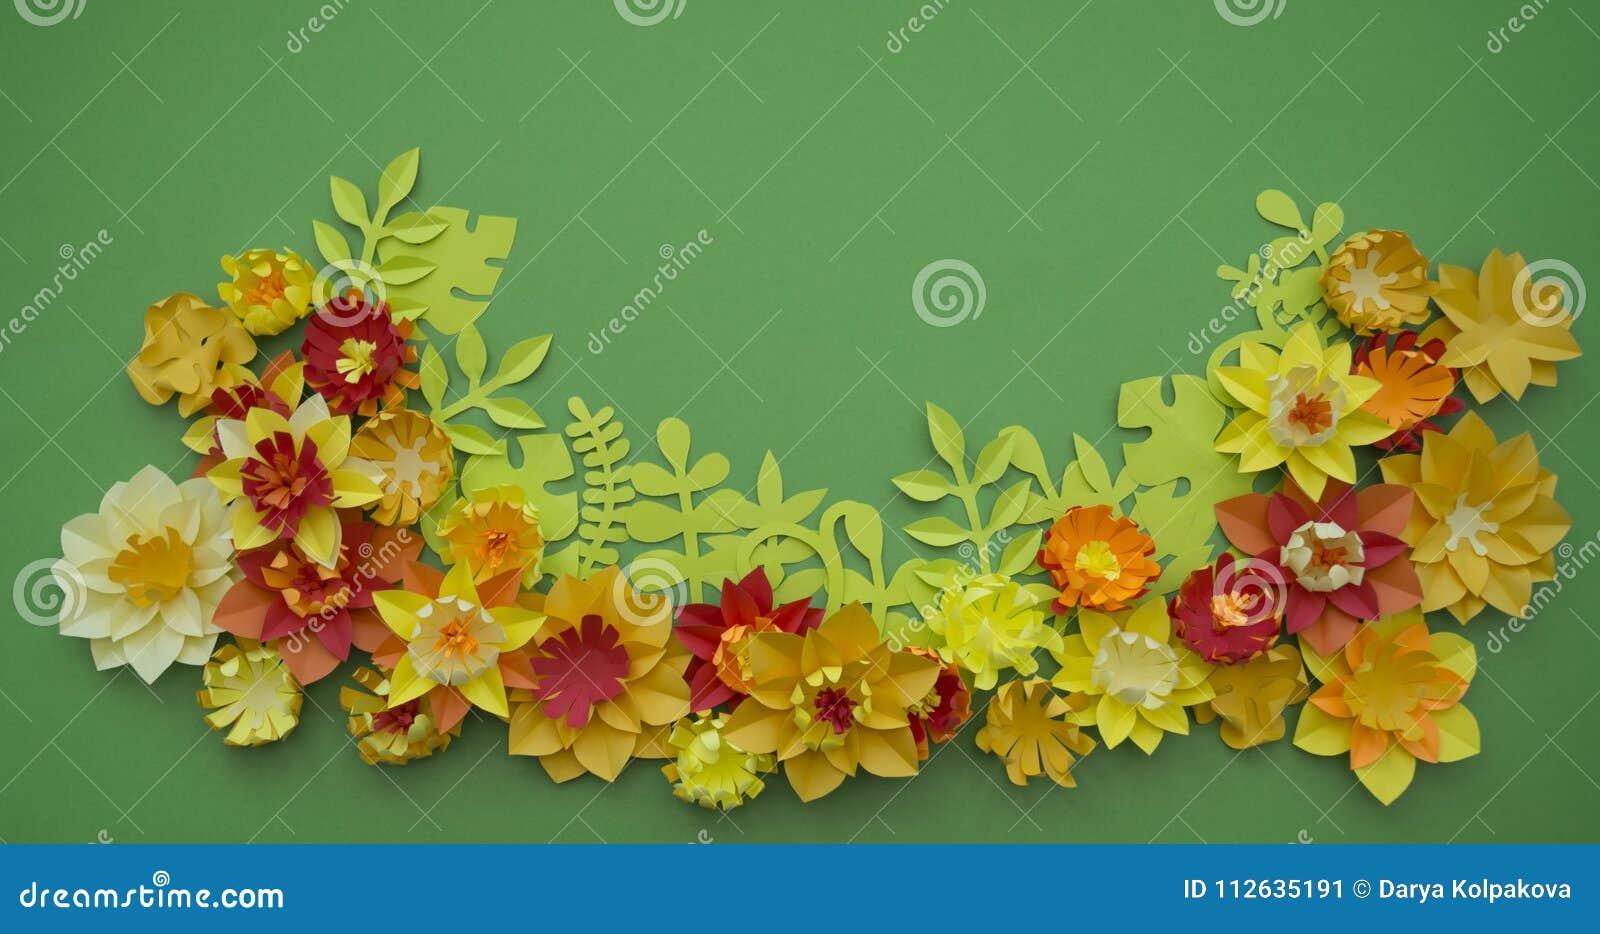 Paper Craft Flower Decoration Concept Border Green Background Stock